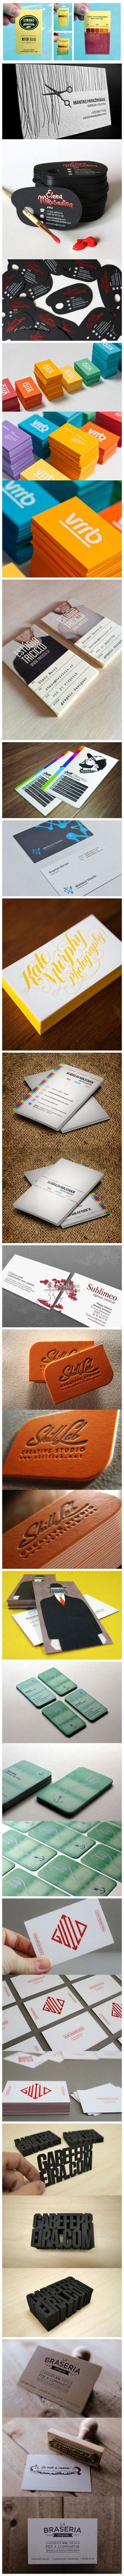 Business card design: